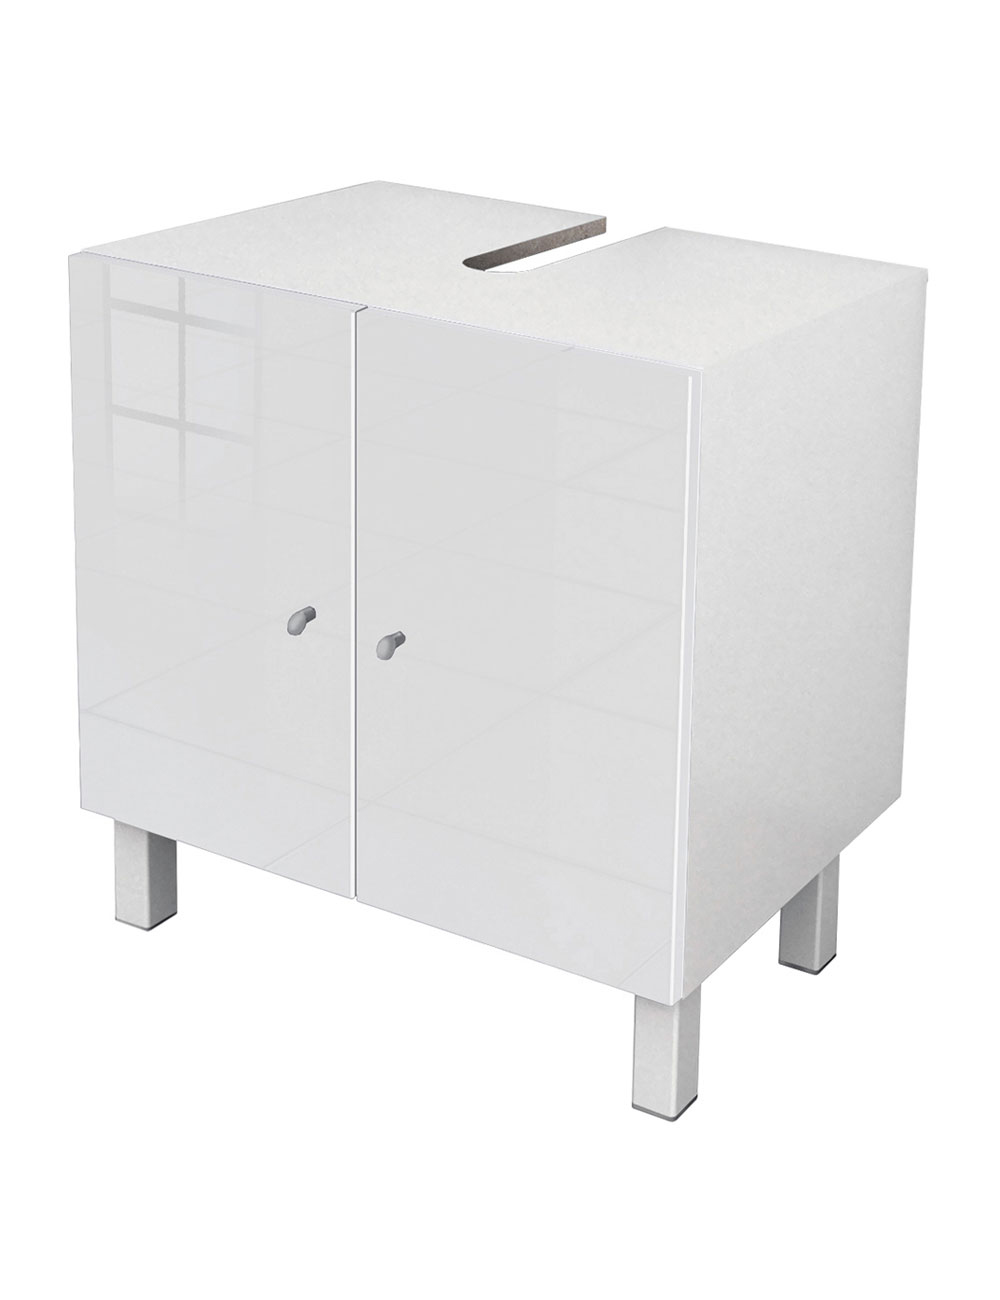 meuble sous lavabo avec finition high gloss blanc. Black Bedroom Furniture Sets. Home Design Ideas